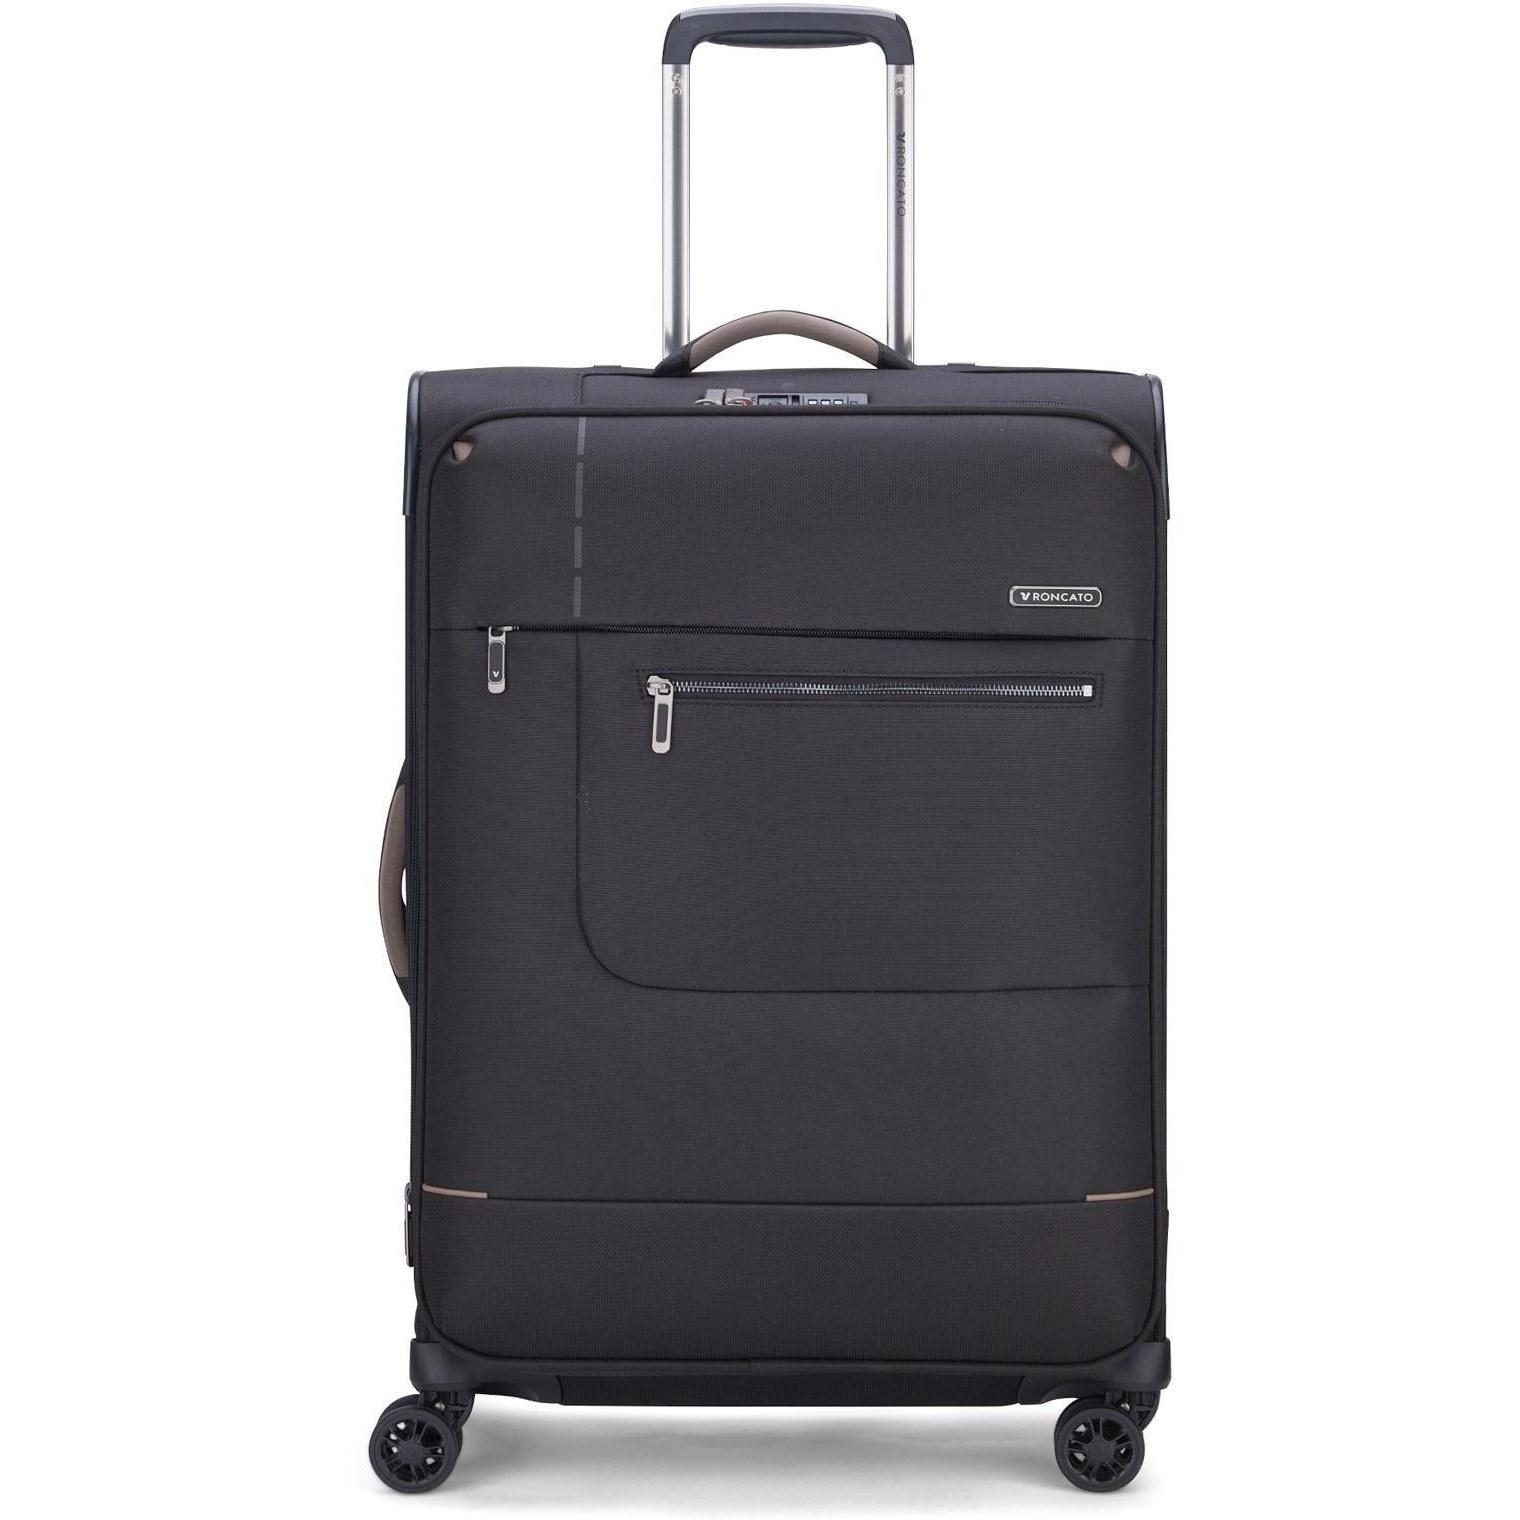 عکس چمدان رونکاتو مدل سایدترک سایز متوسط مشکی  چمدان-رونکاتو-مدل-سایدترک-سایز-متوسط-مشکی